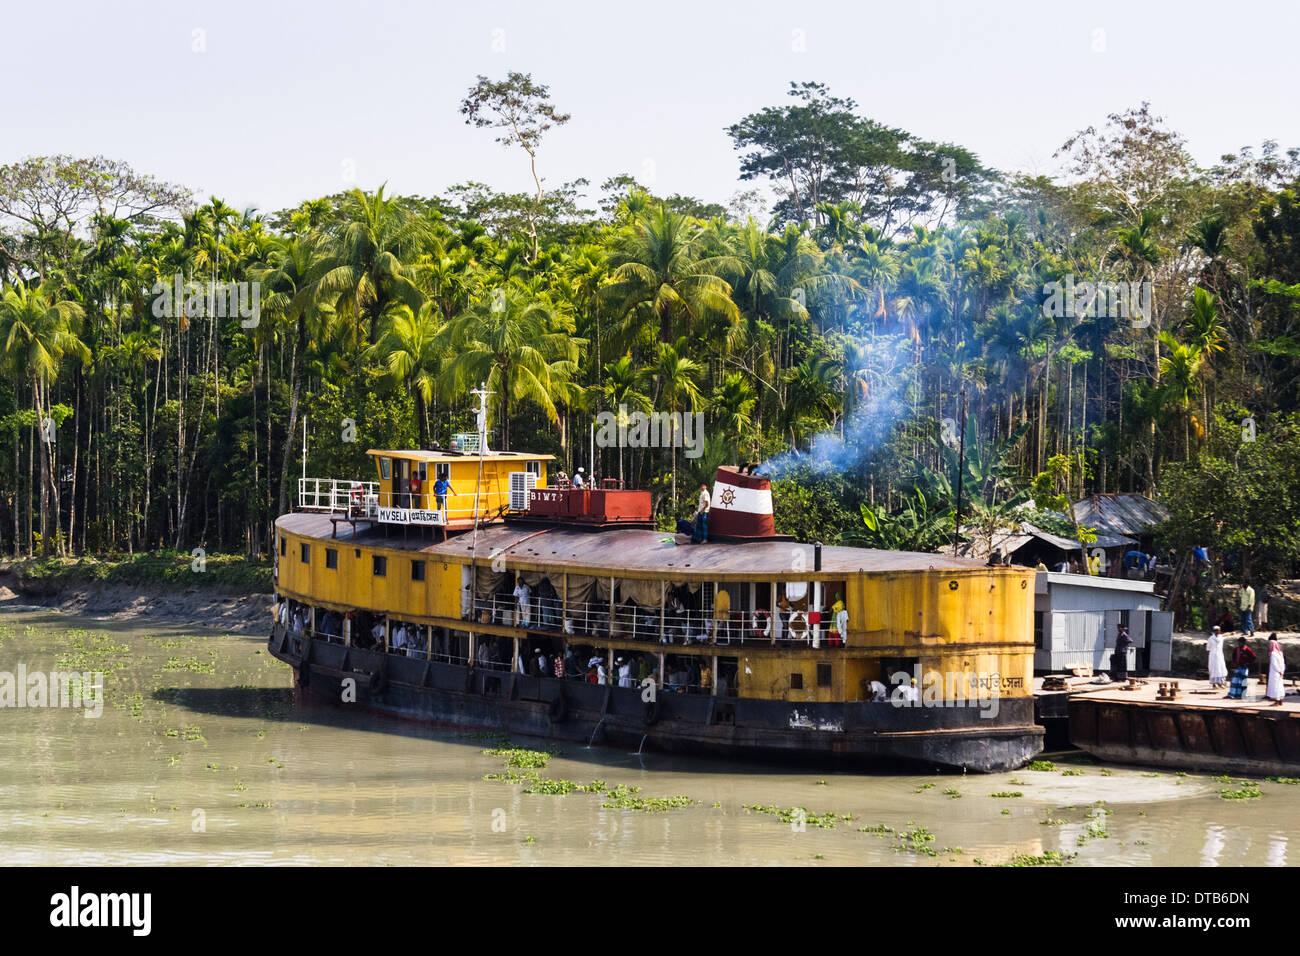 Rocket Steamer (paddle-wheel) boat traveling from Khulna to Dhaka, Sundarbans, Bangladesh - Stock Image